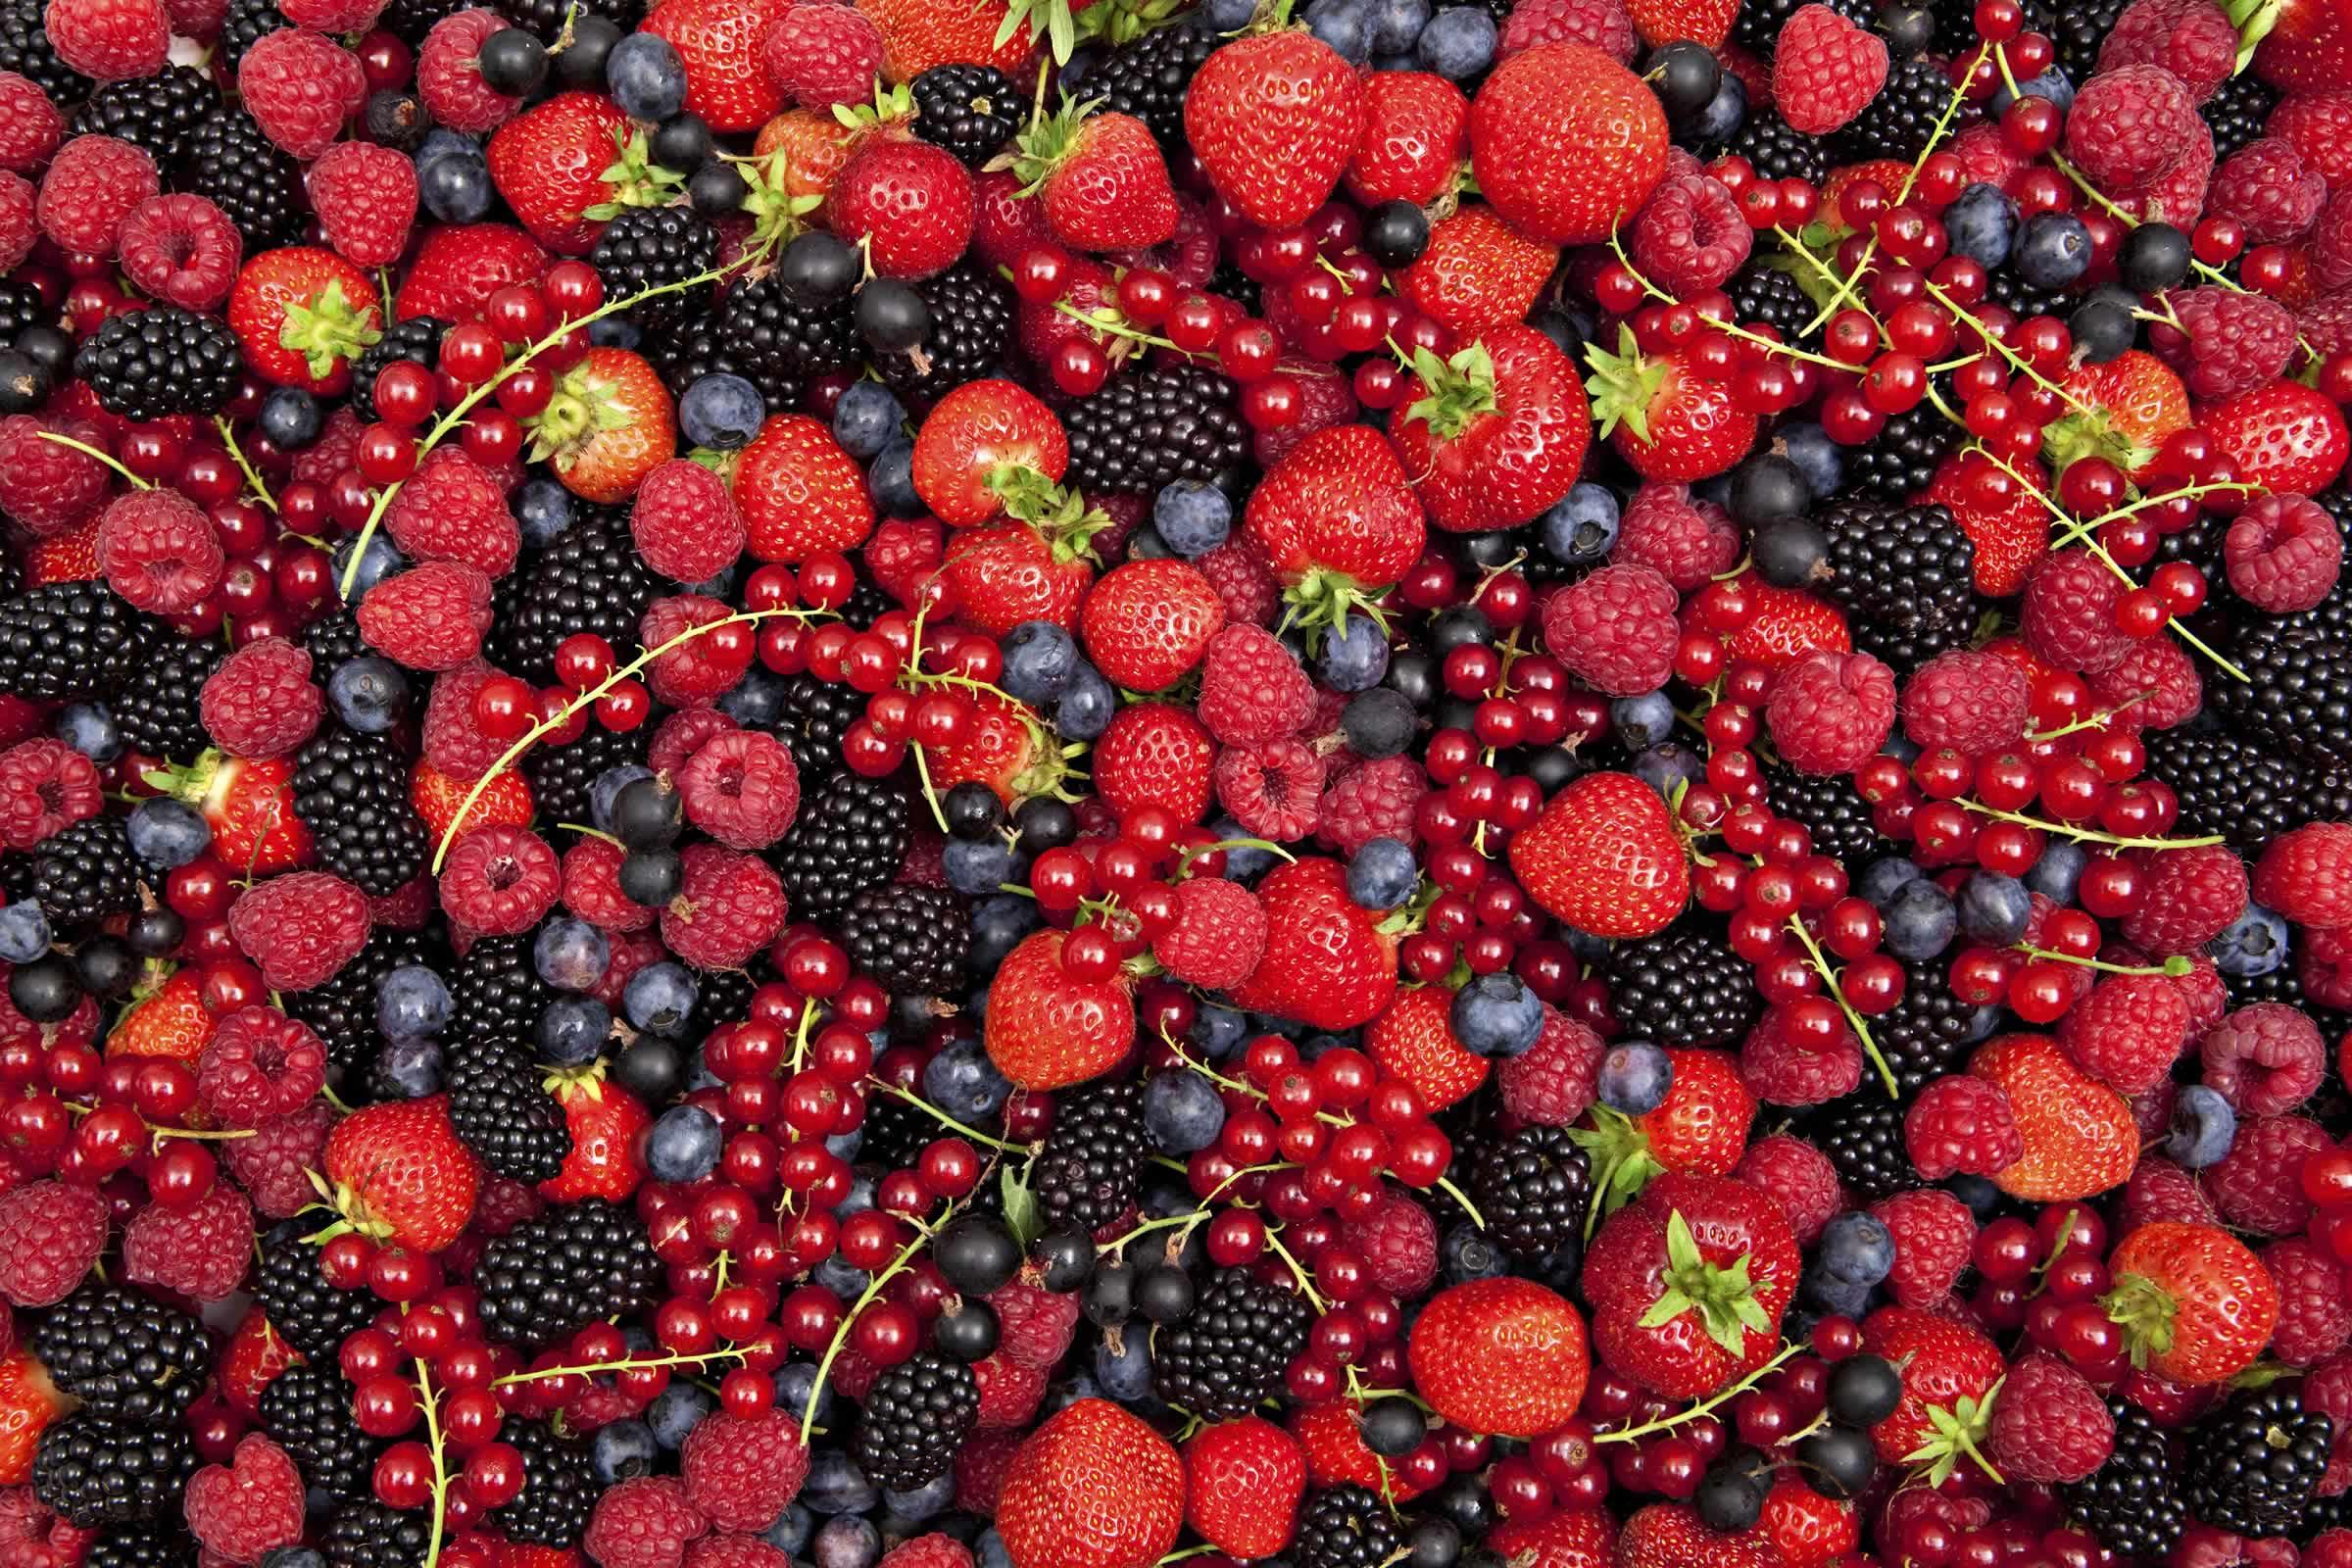 Berry mixture